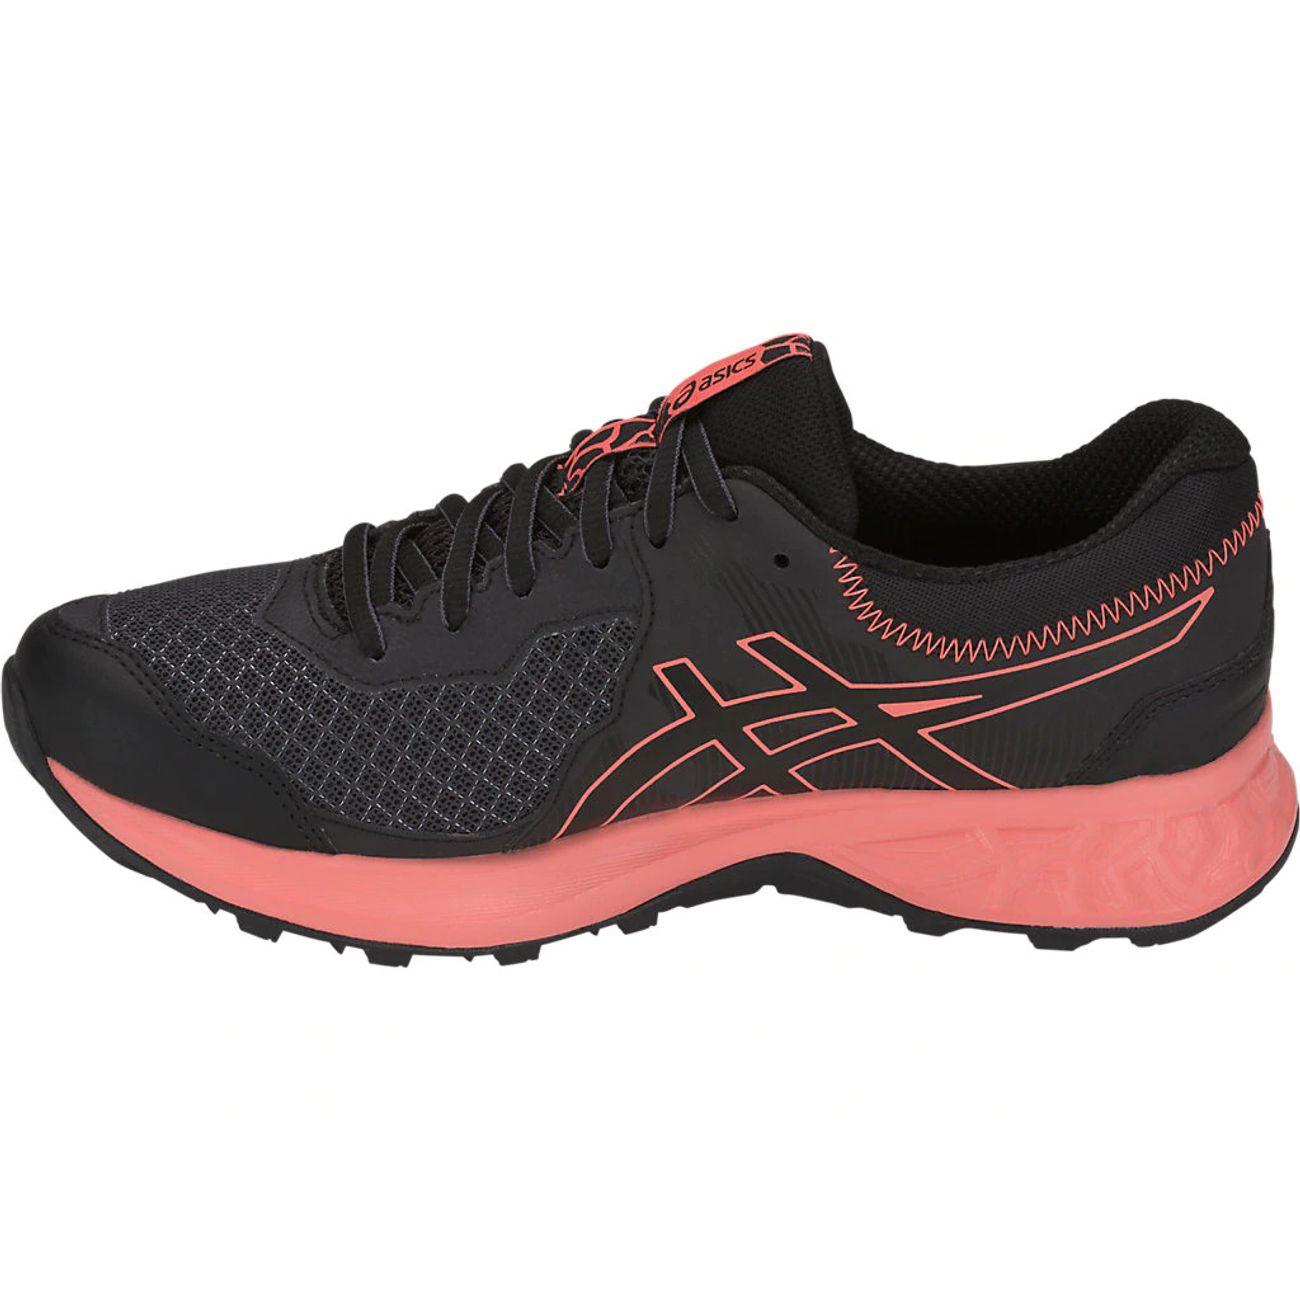 4 Femme G Fitness Gel Asics Chaussures Sonoma Tx OkiZuXTPw